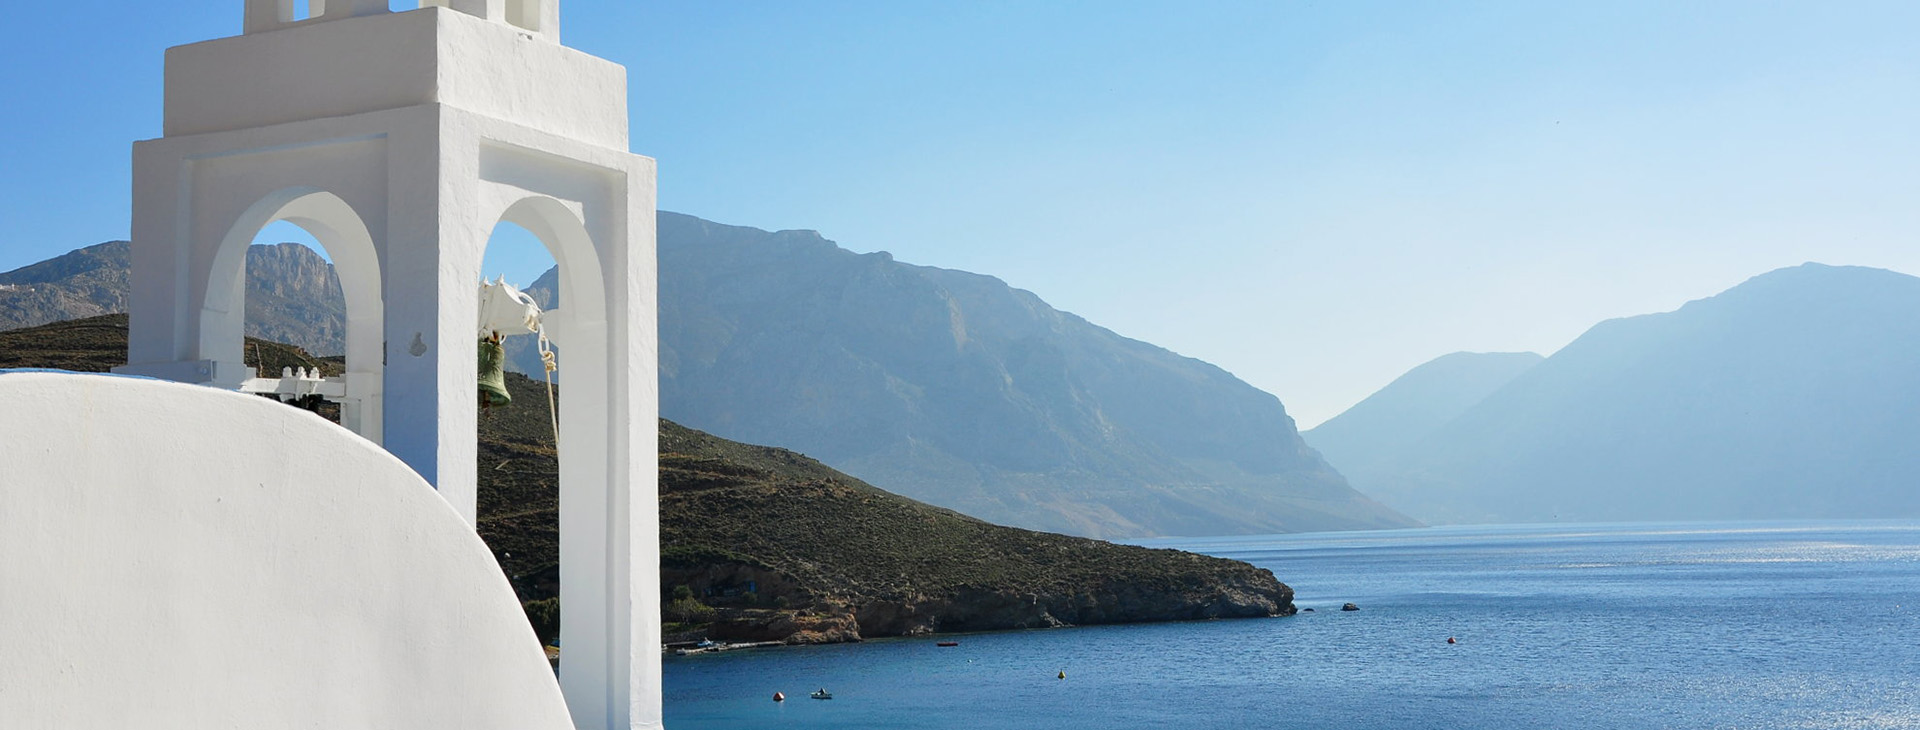 Kalimnos island